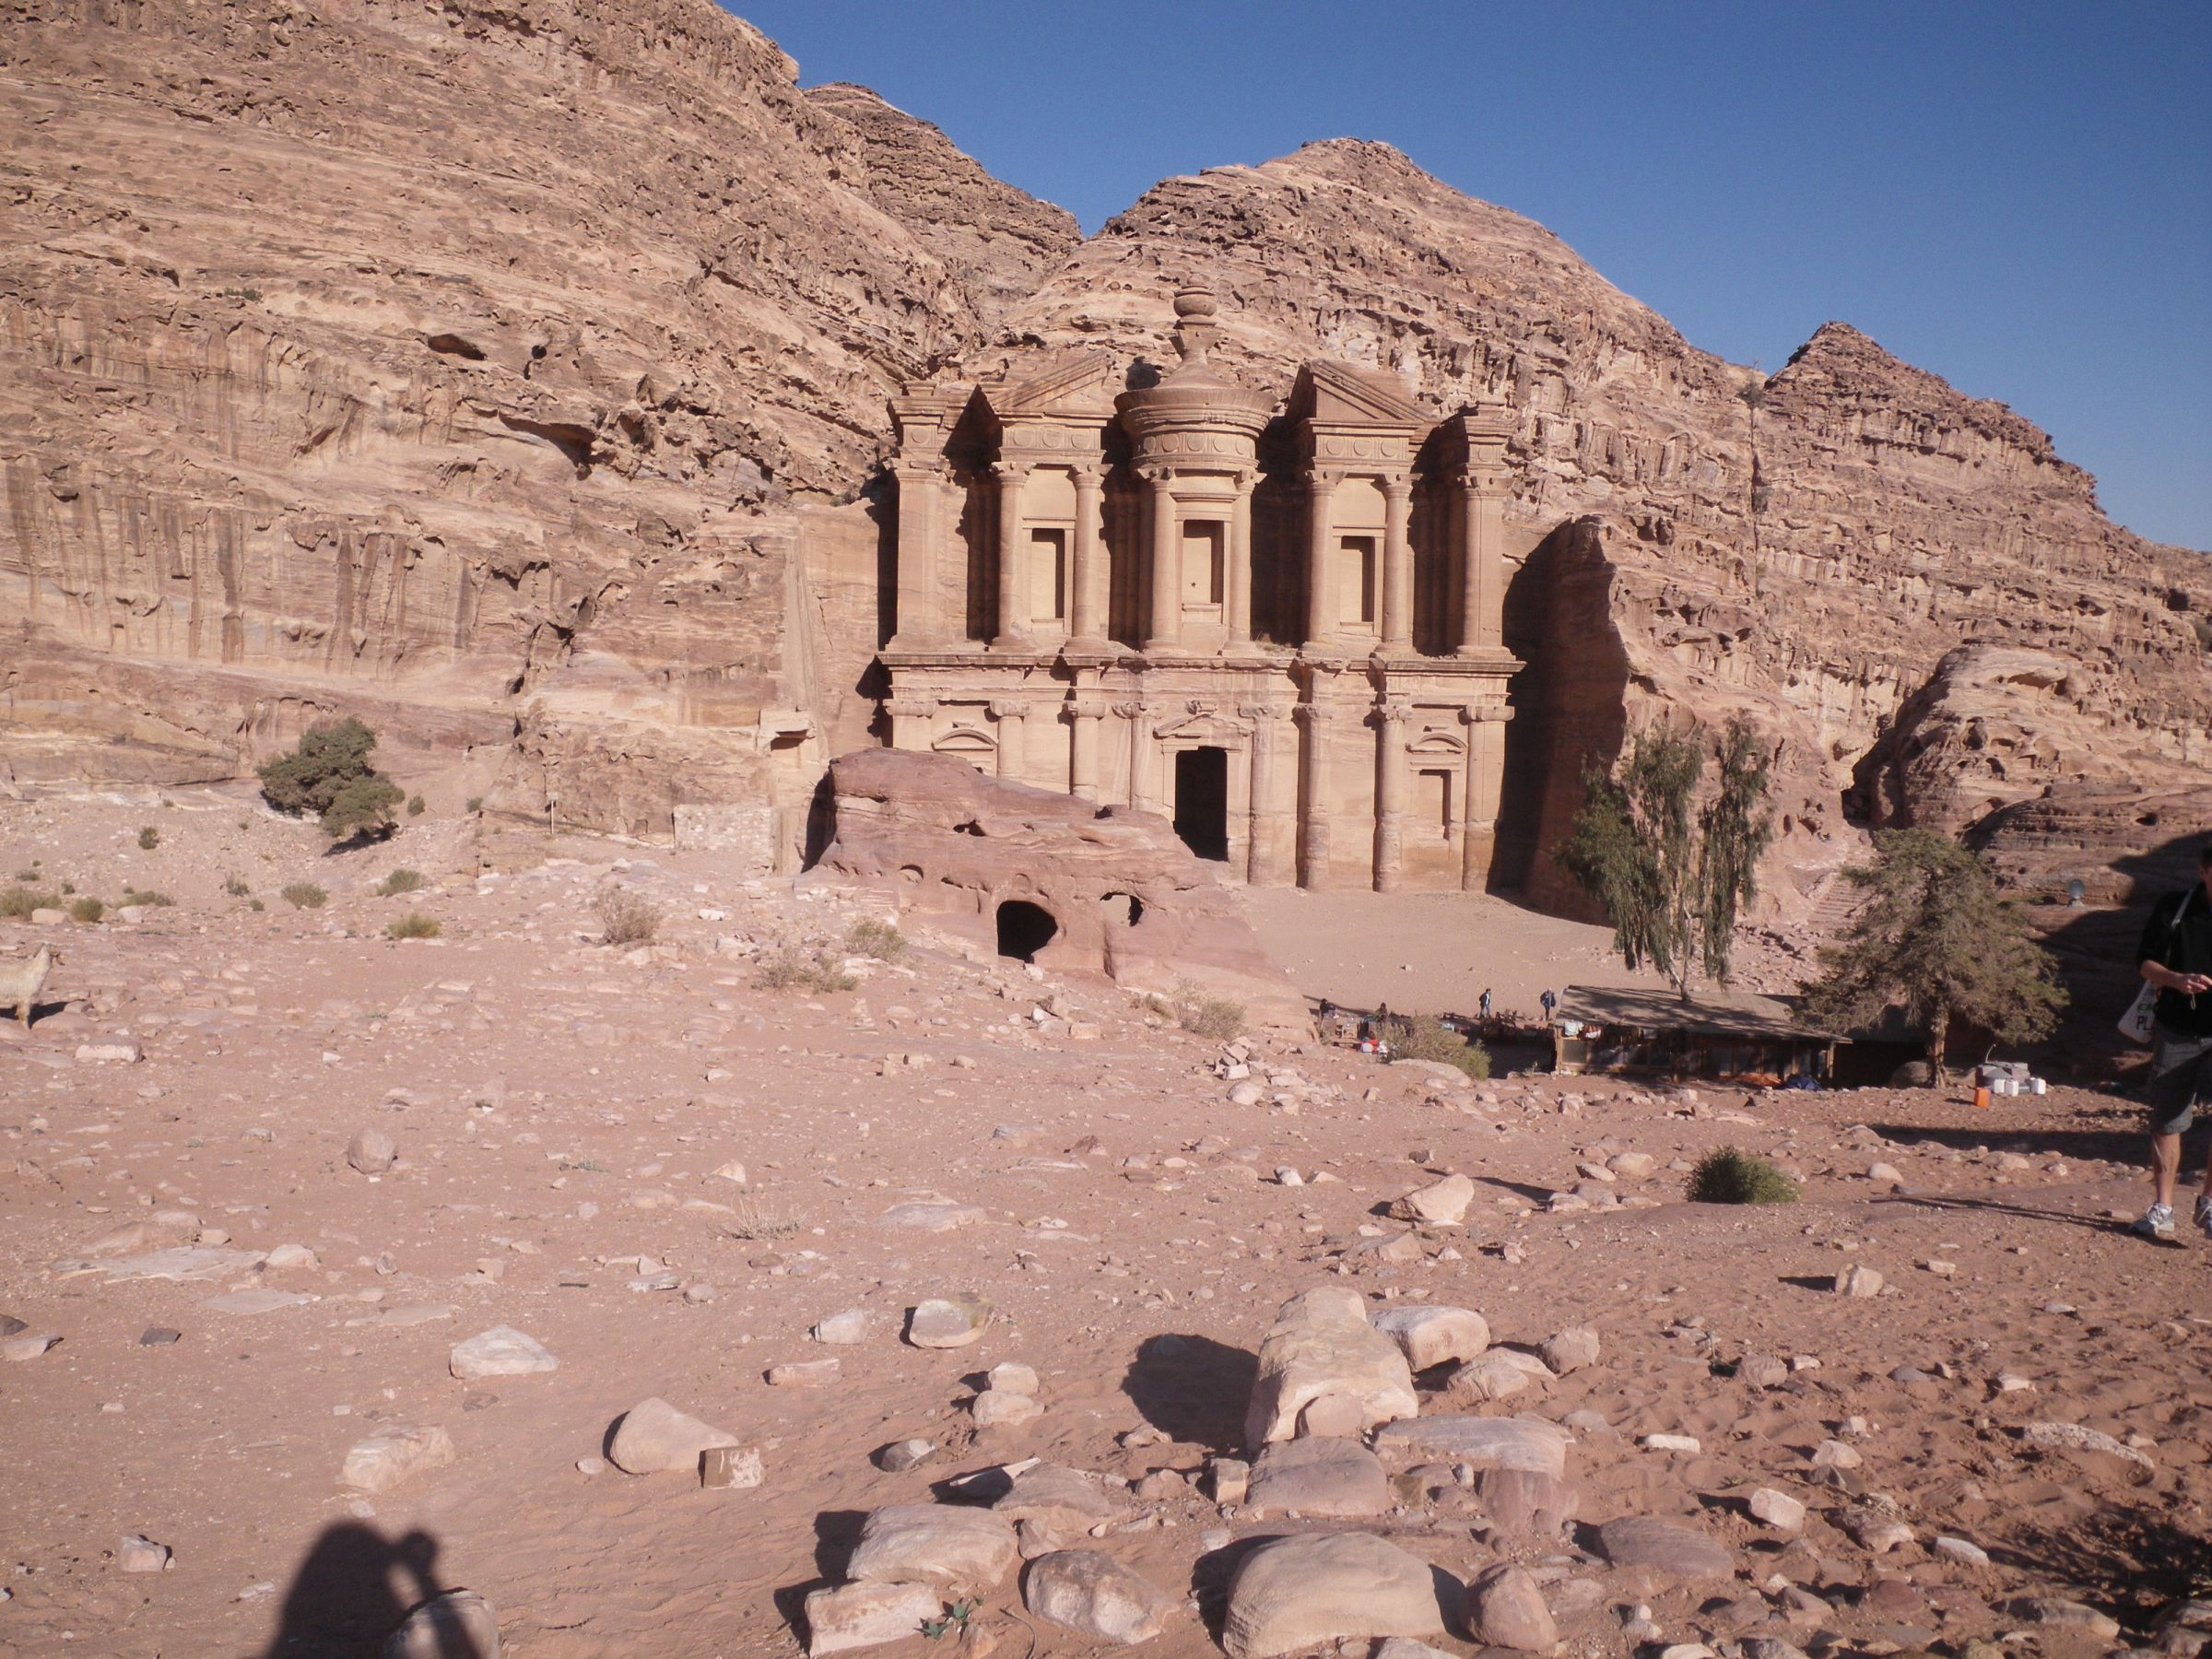 klippstaden Petra på Gyllintours